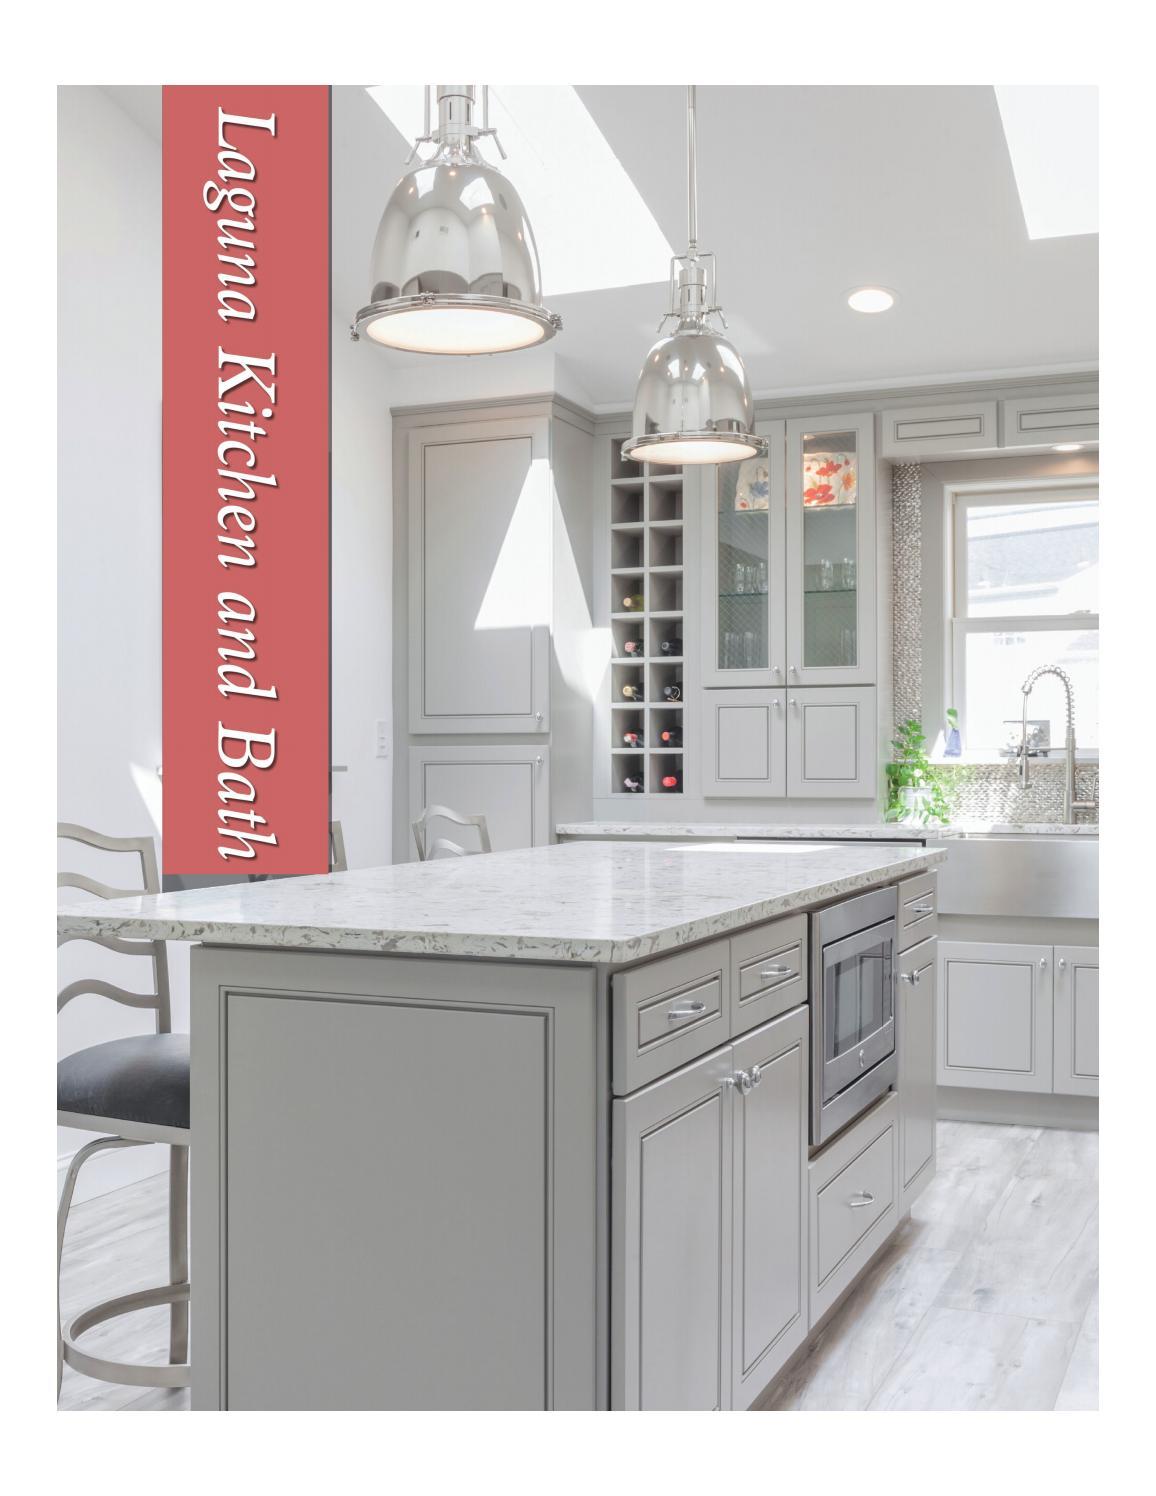 Kitchen Remodeling in Orange County by comtek - issuu